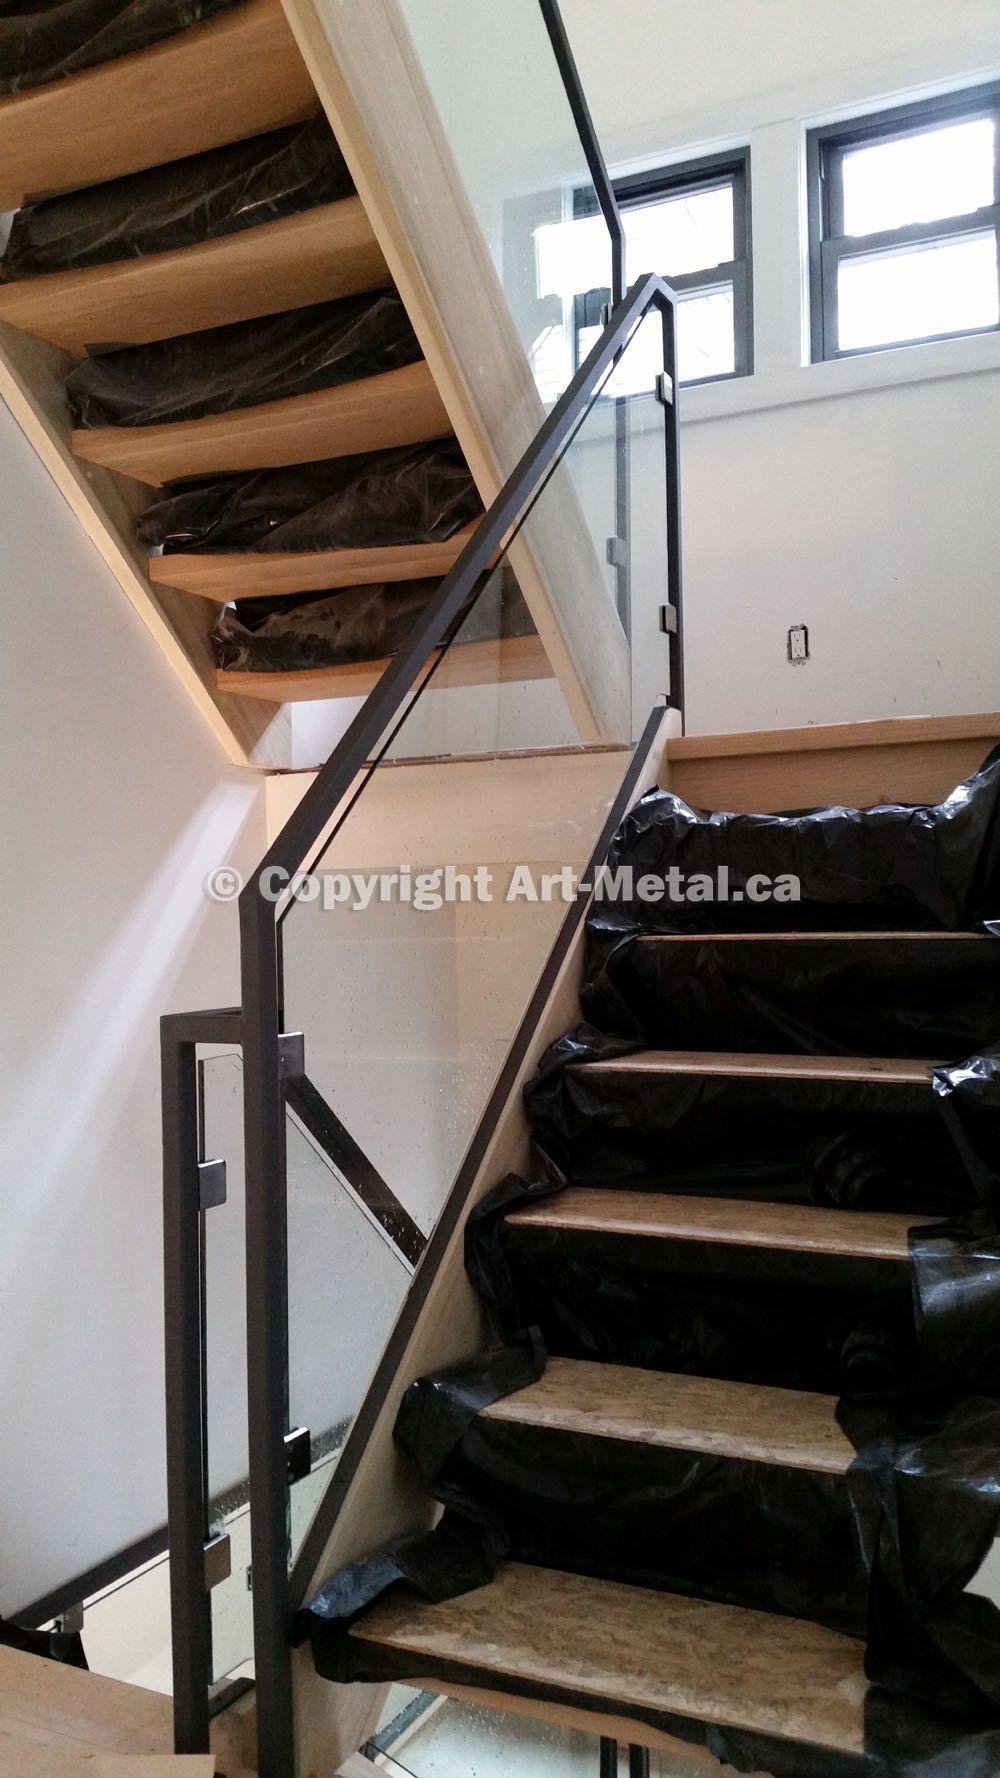 Best Glass Railing Systems Toronto Stair Balcony Deck Interior Exterior Interior Railings 400 x 300